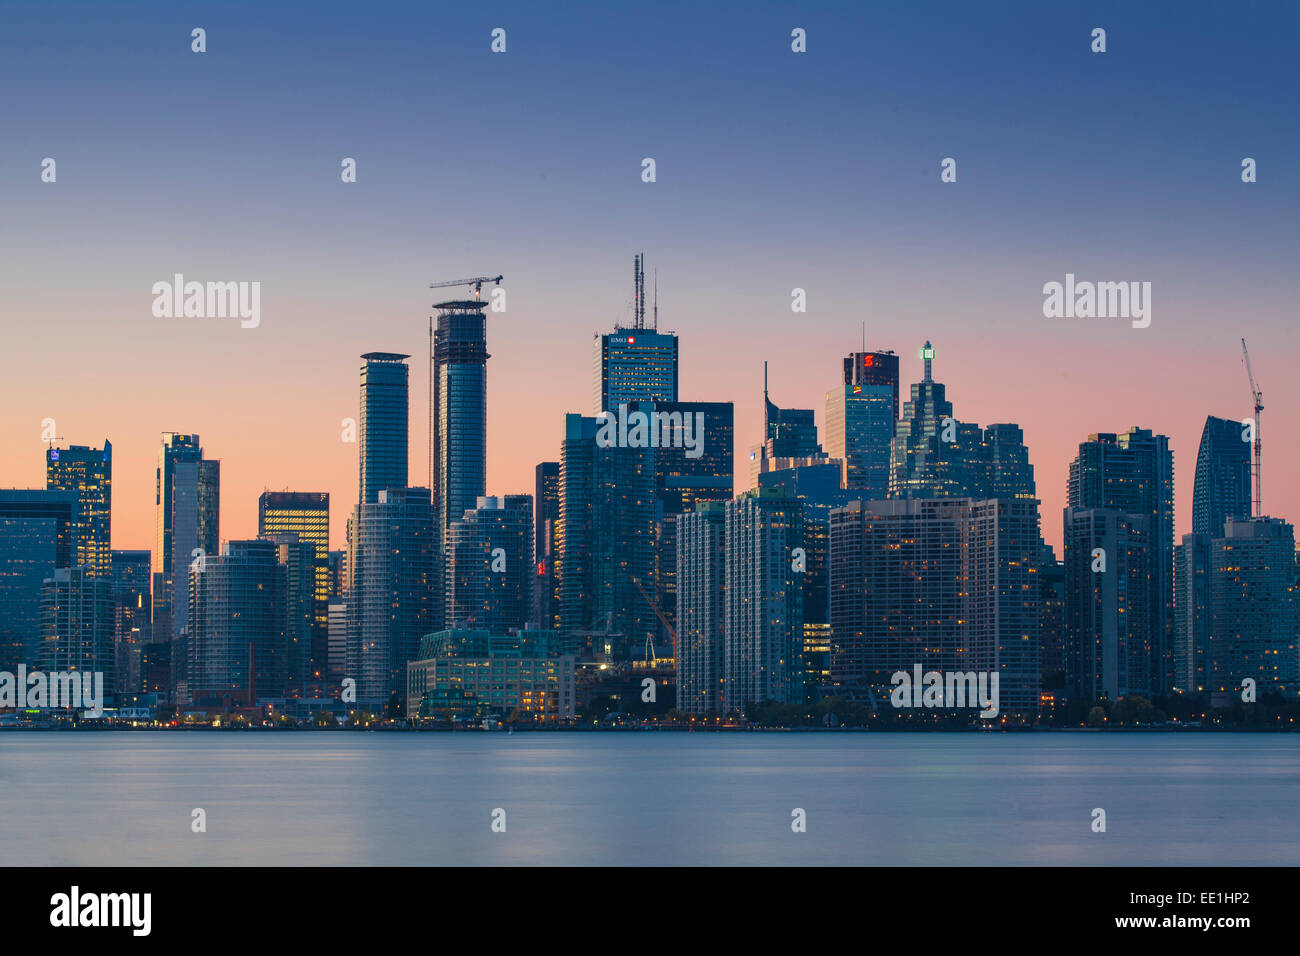 Ansicht der Stadt Skyline, Toronto, Ontario, Kanada, Nordamerika Stockbild